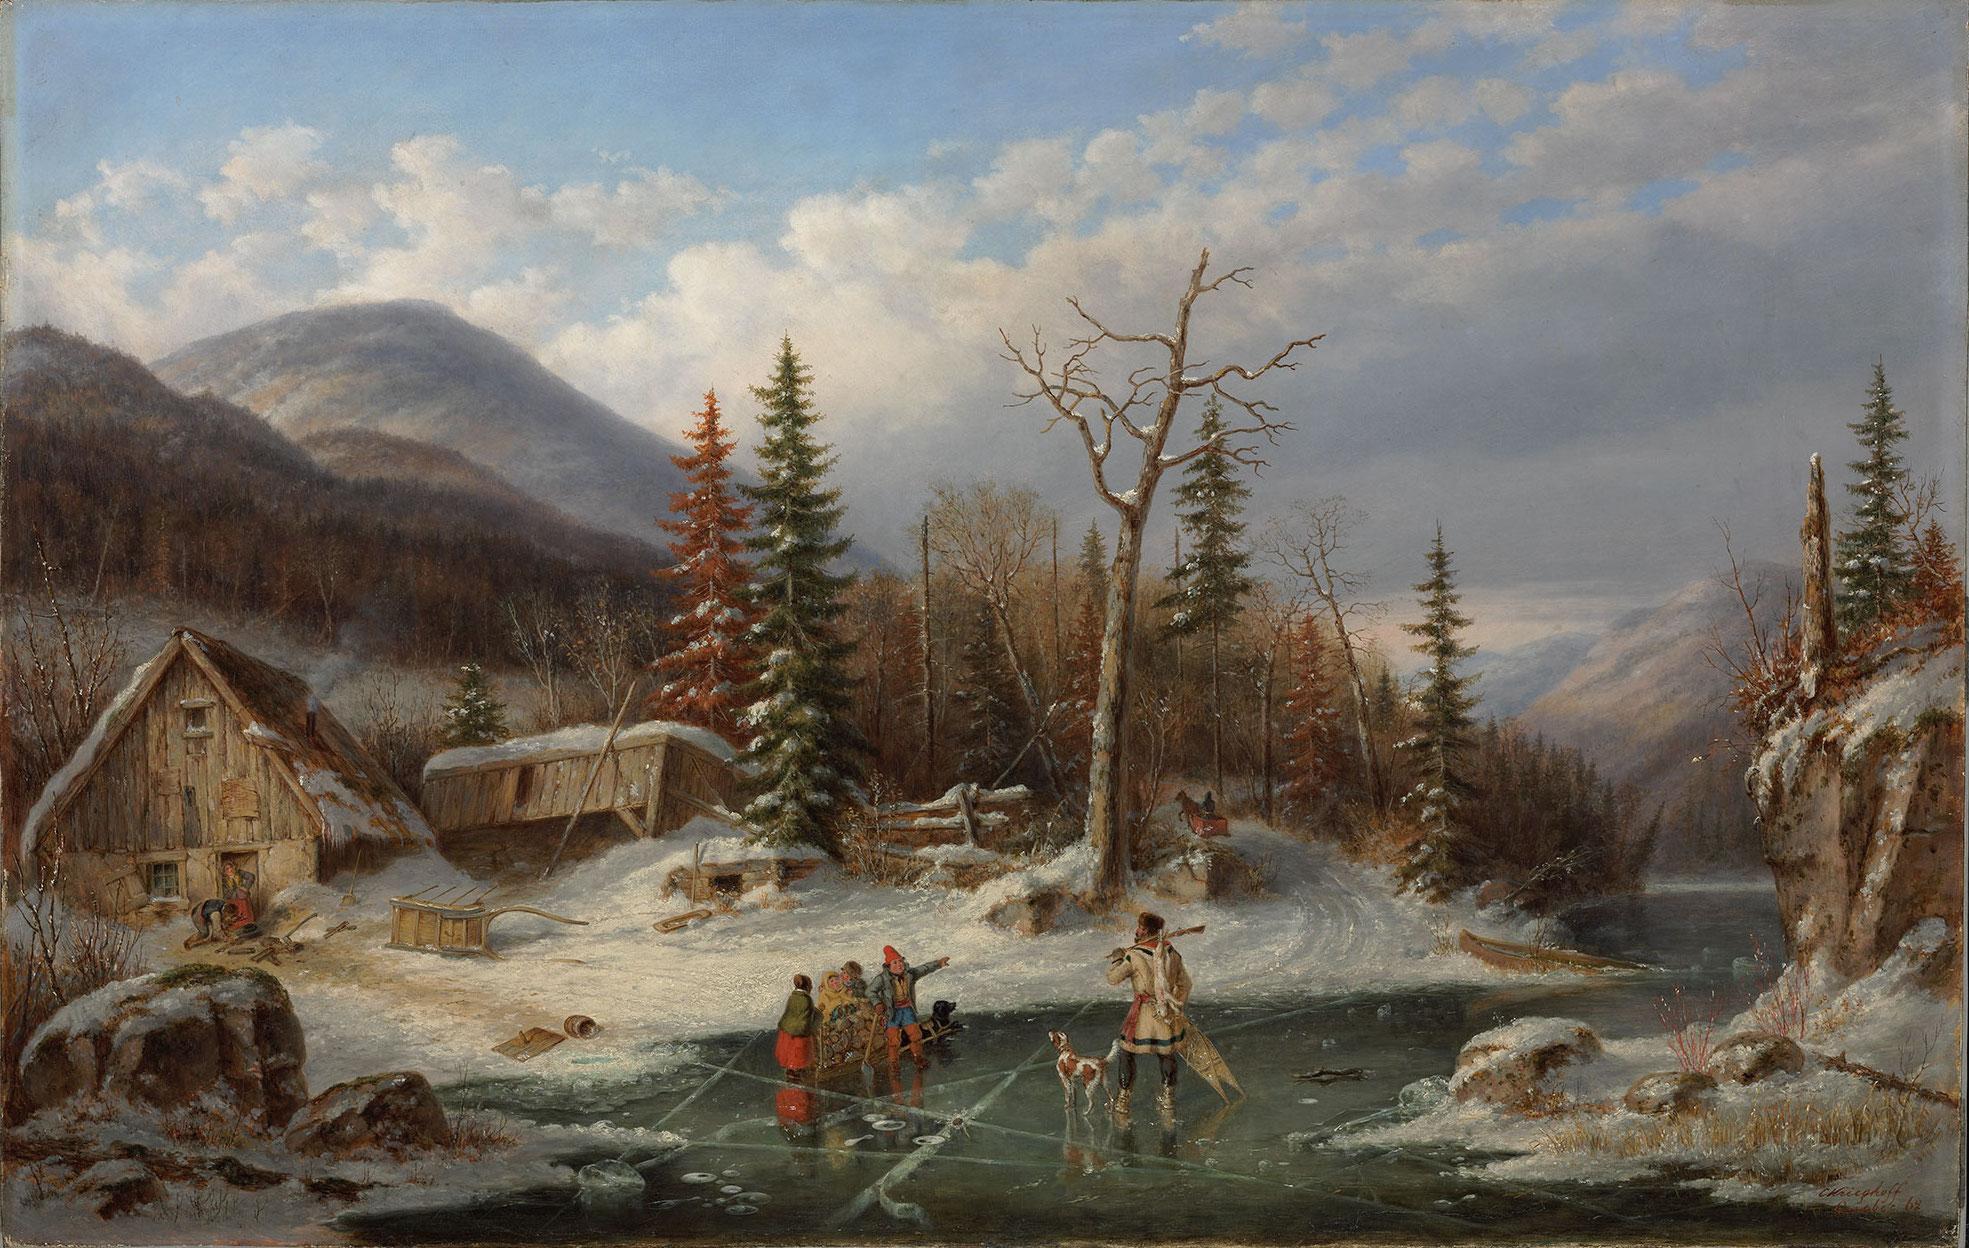 Landscape Oil Paintings Signed I Caffrey